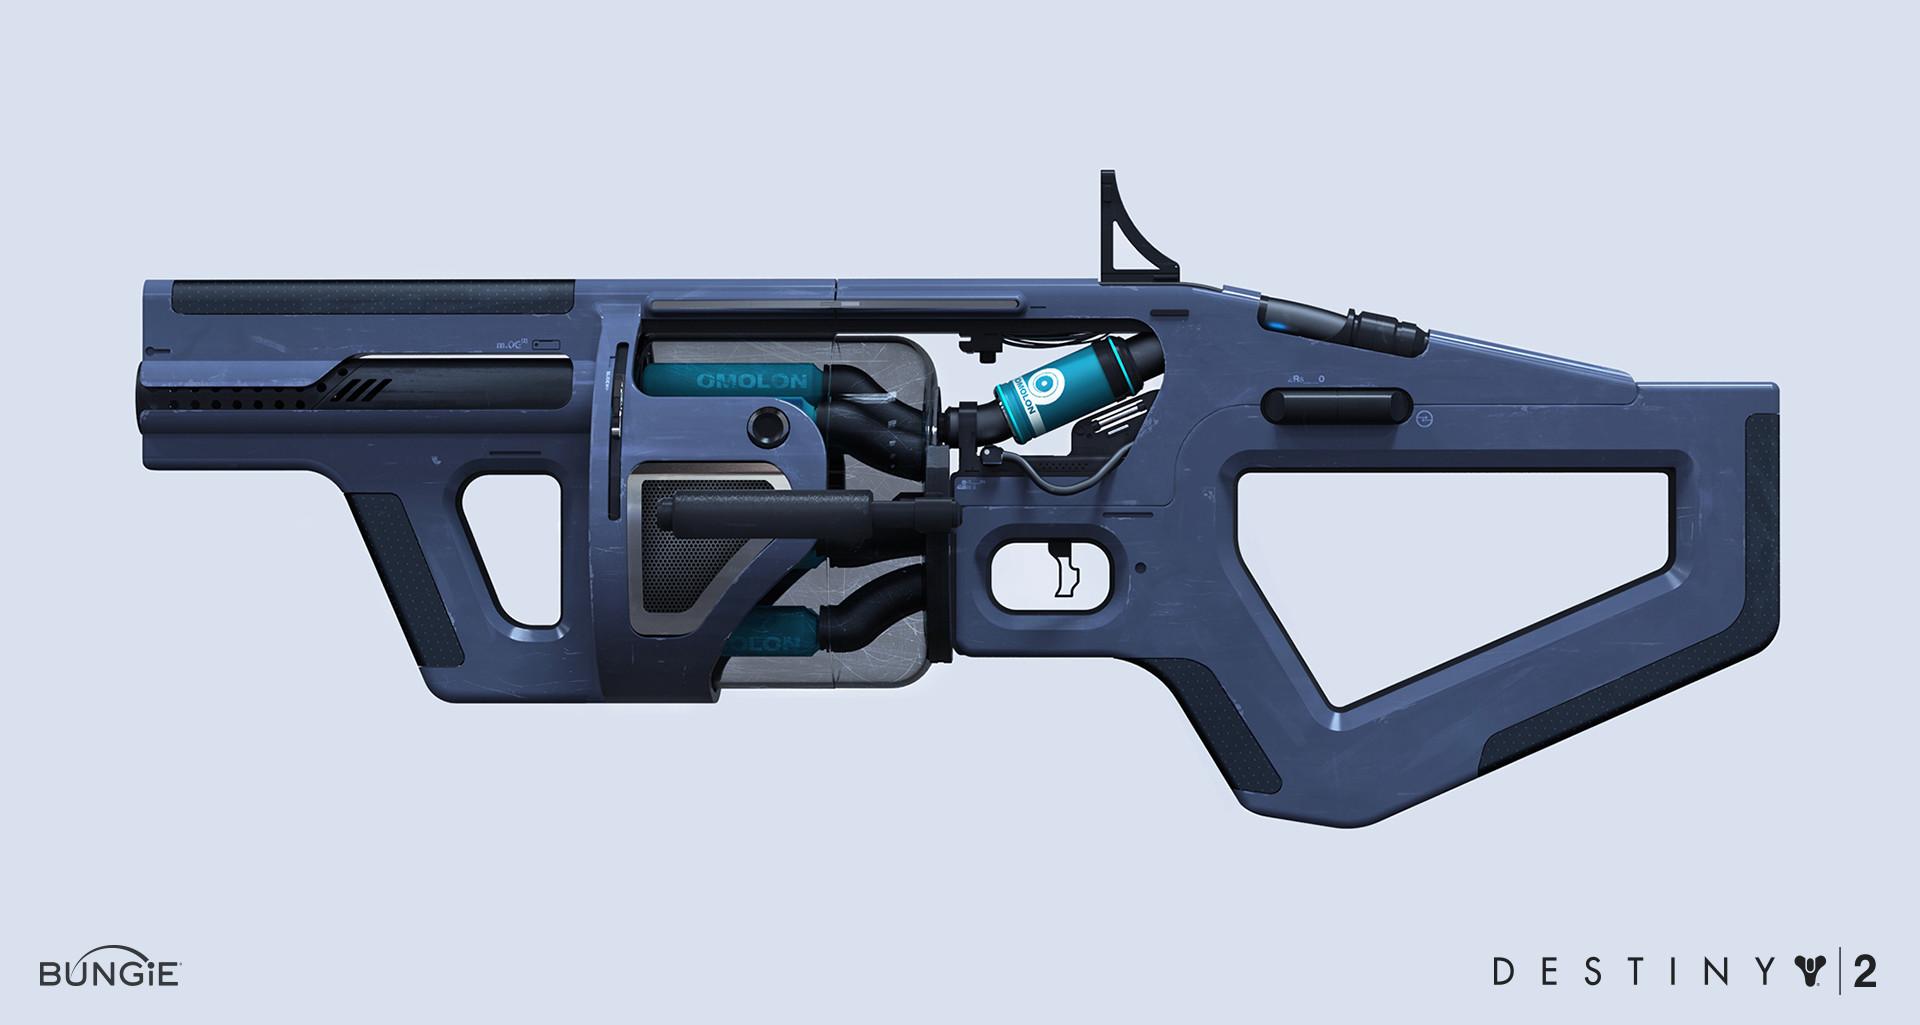 Dima Goryainov Destiny 2 Omolon Grenade Launcher